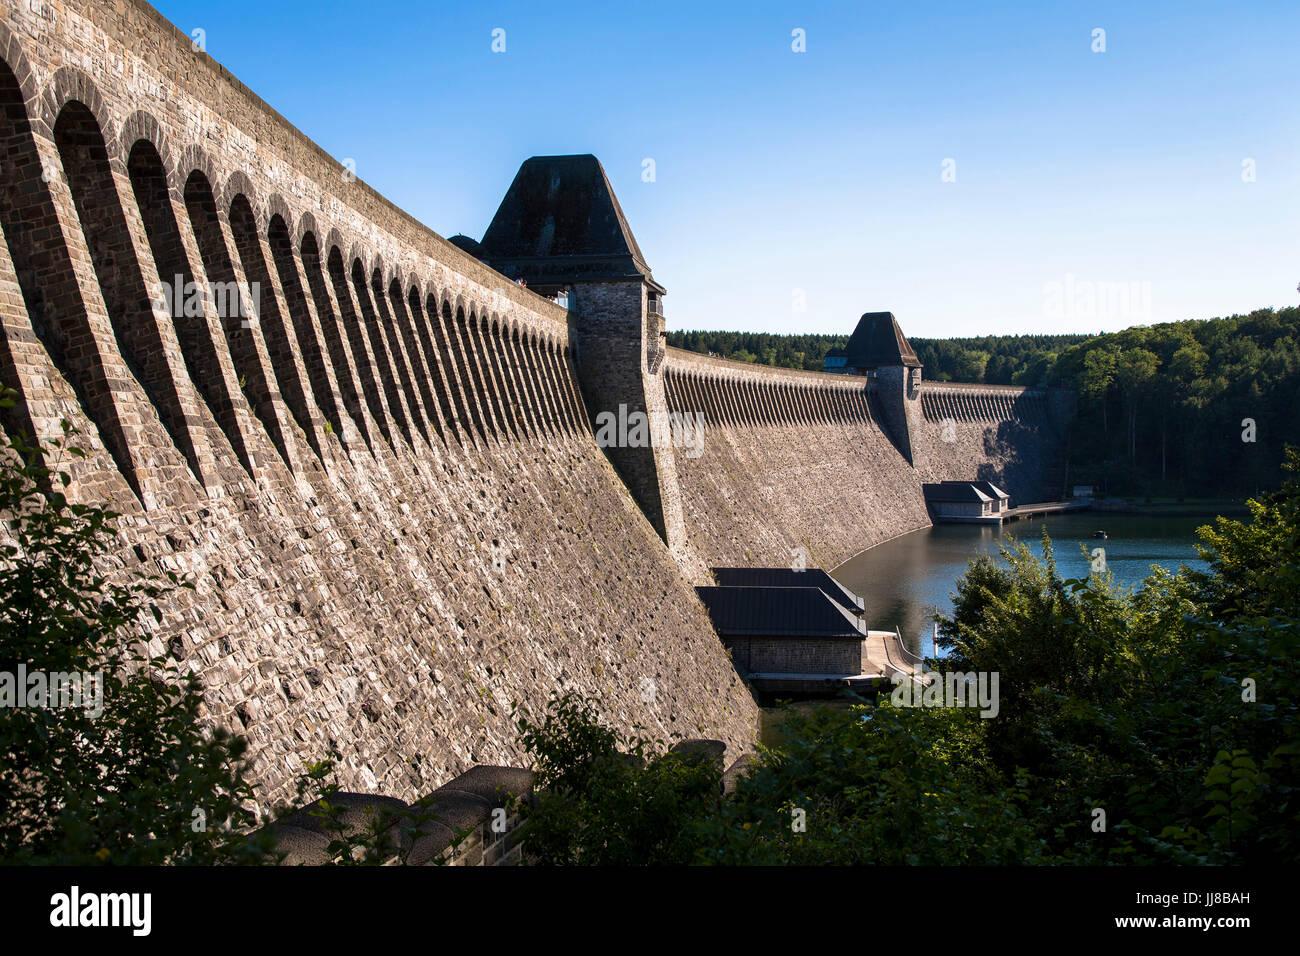 DEU, Germany, Sauerland region, Moehnesee, Moehensee water supply dam.  DEU, Deutschland, Sauerland, Moehnesee, Stock Photo